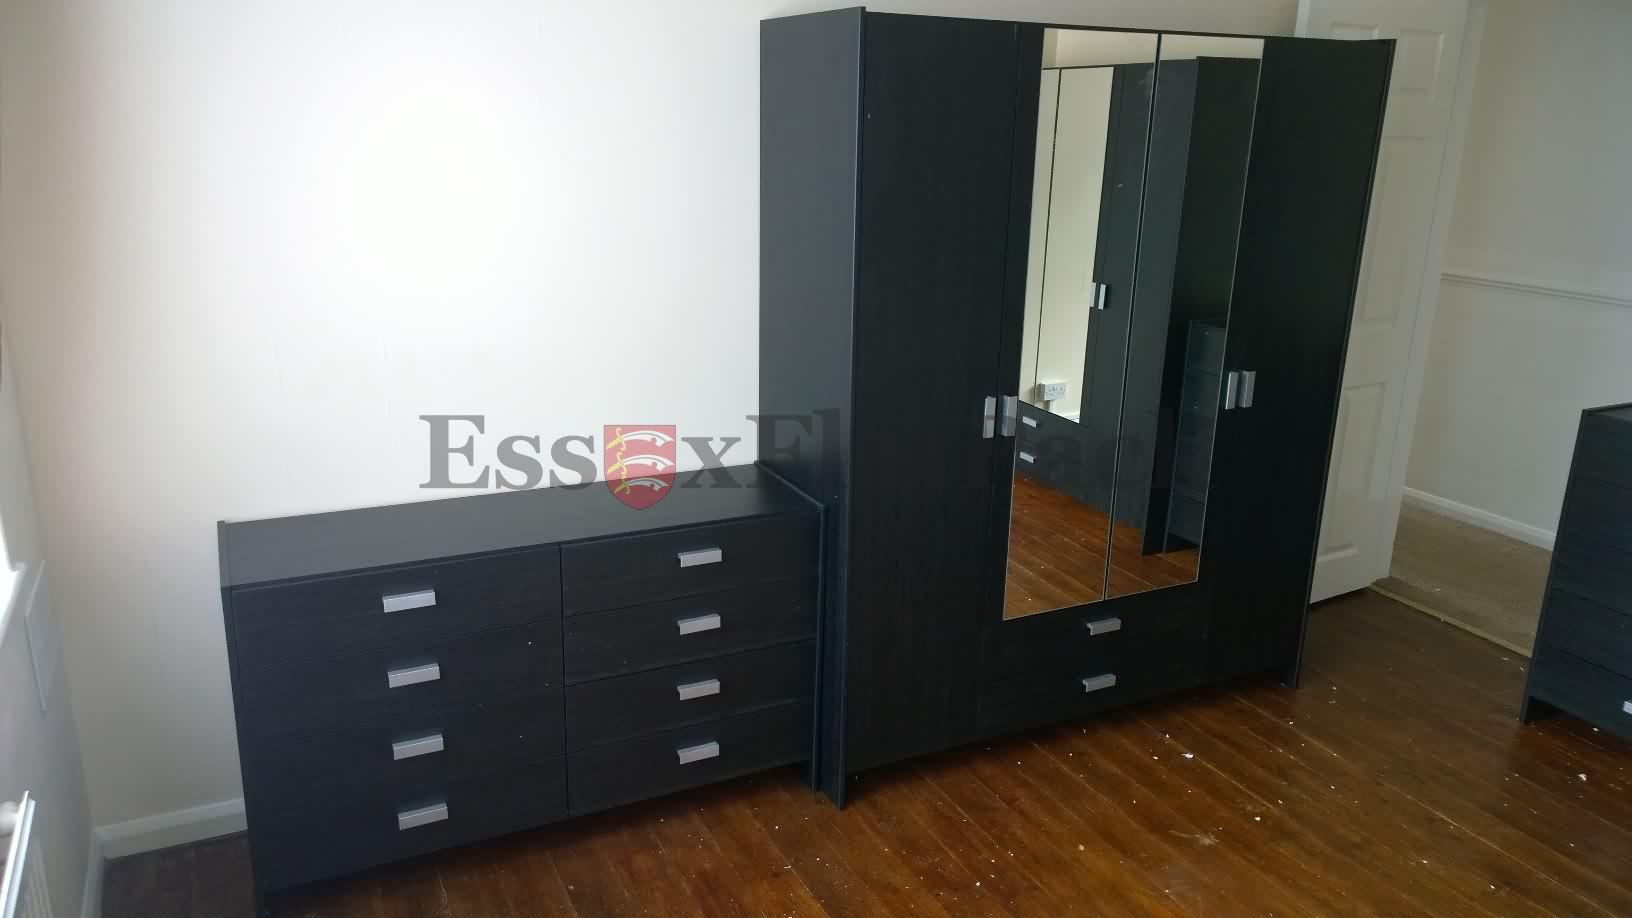 essexflatpack-furniture-20170812123243.jpg